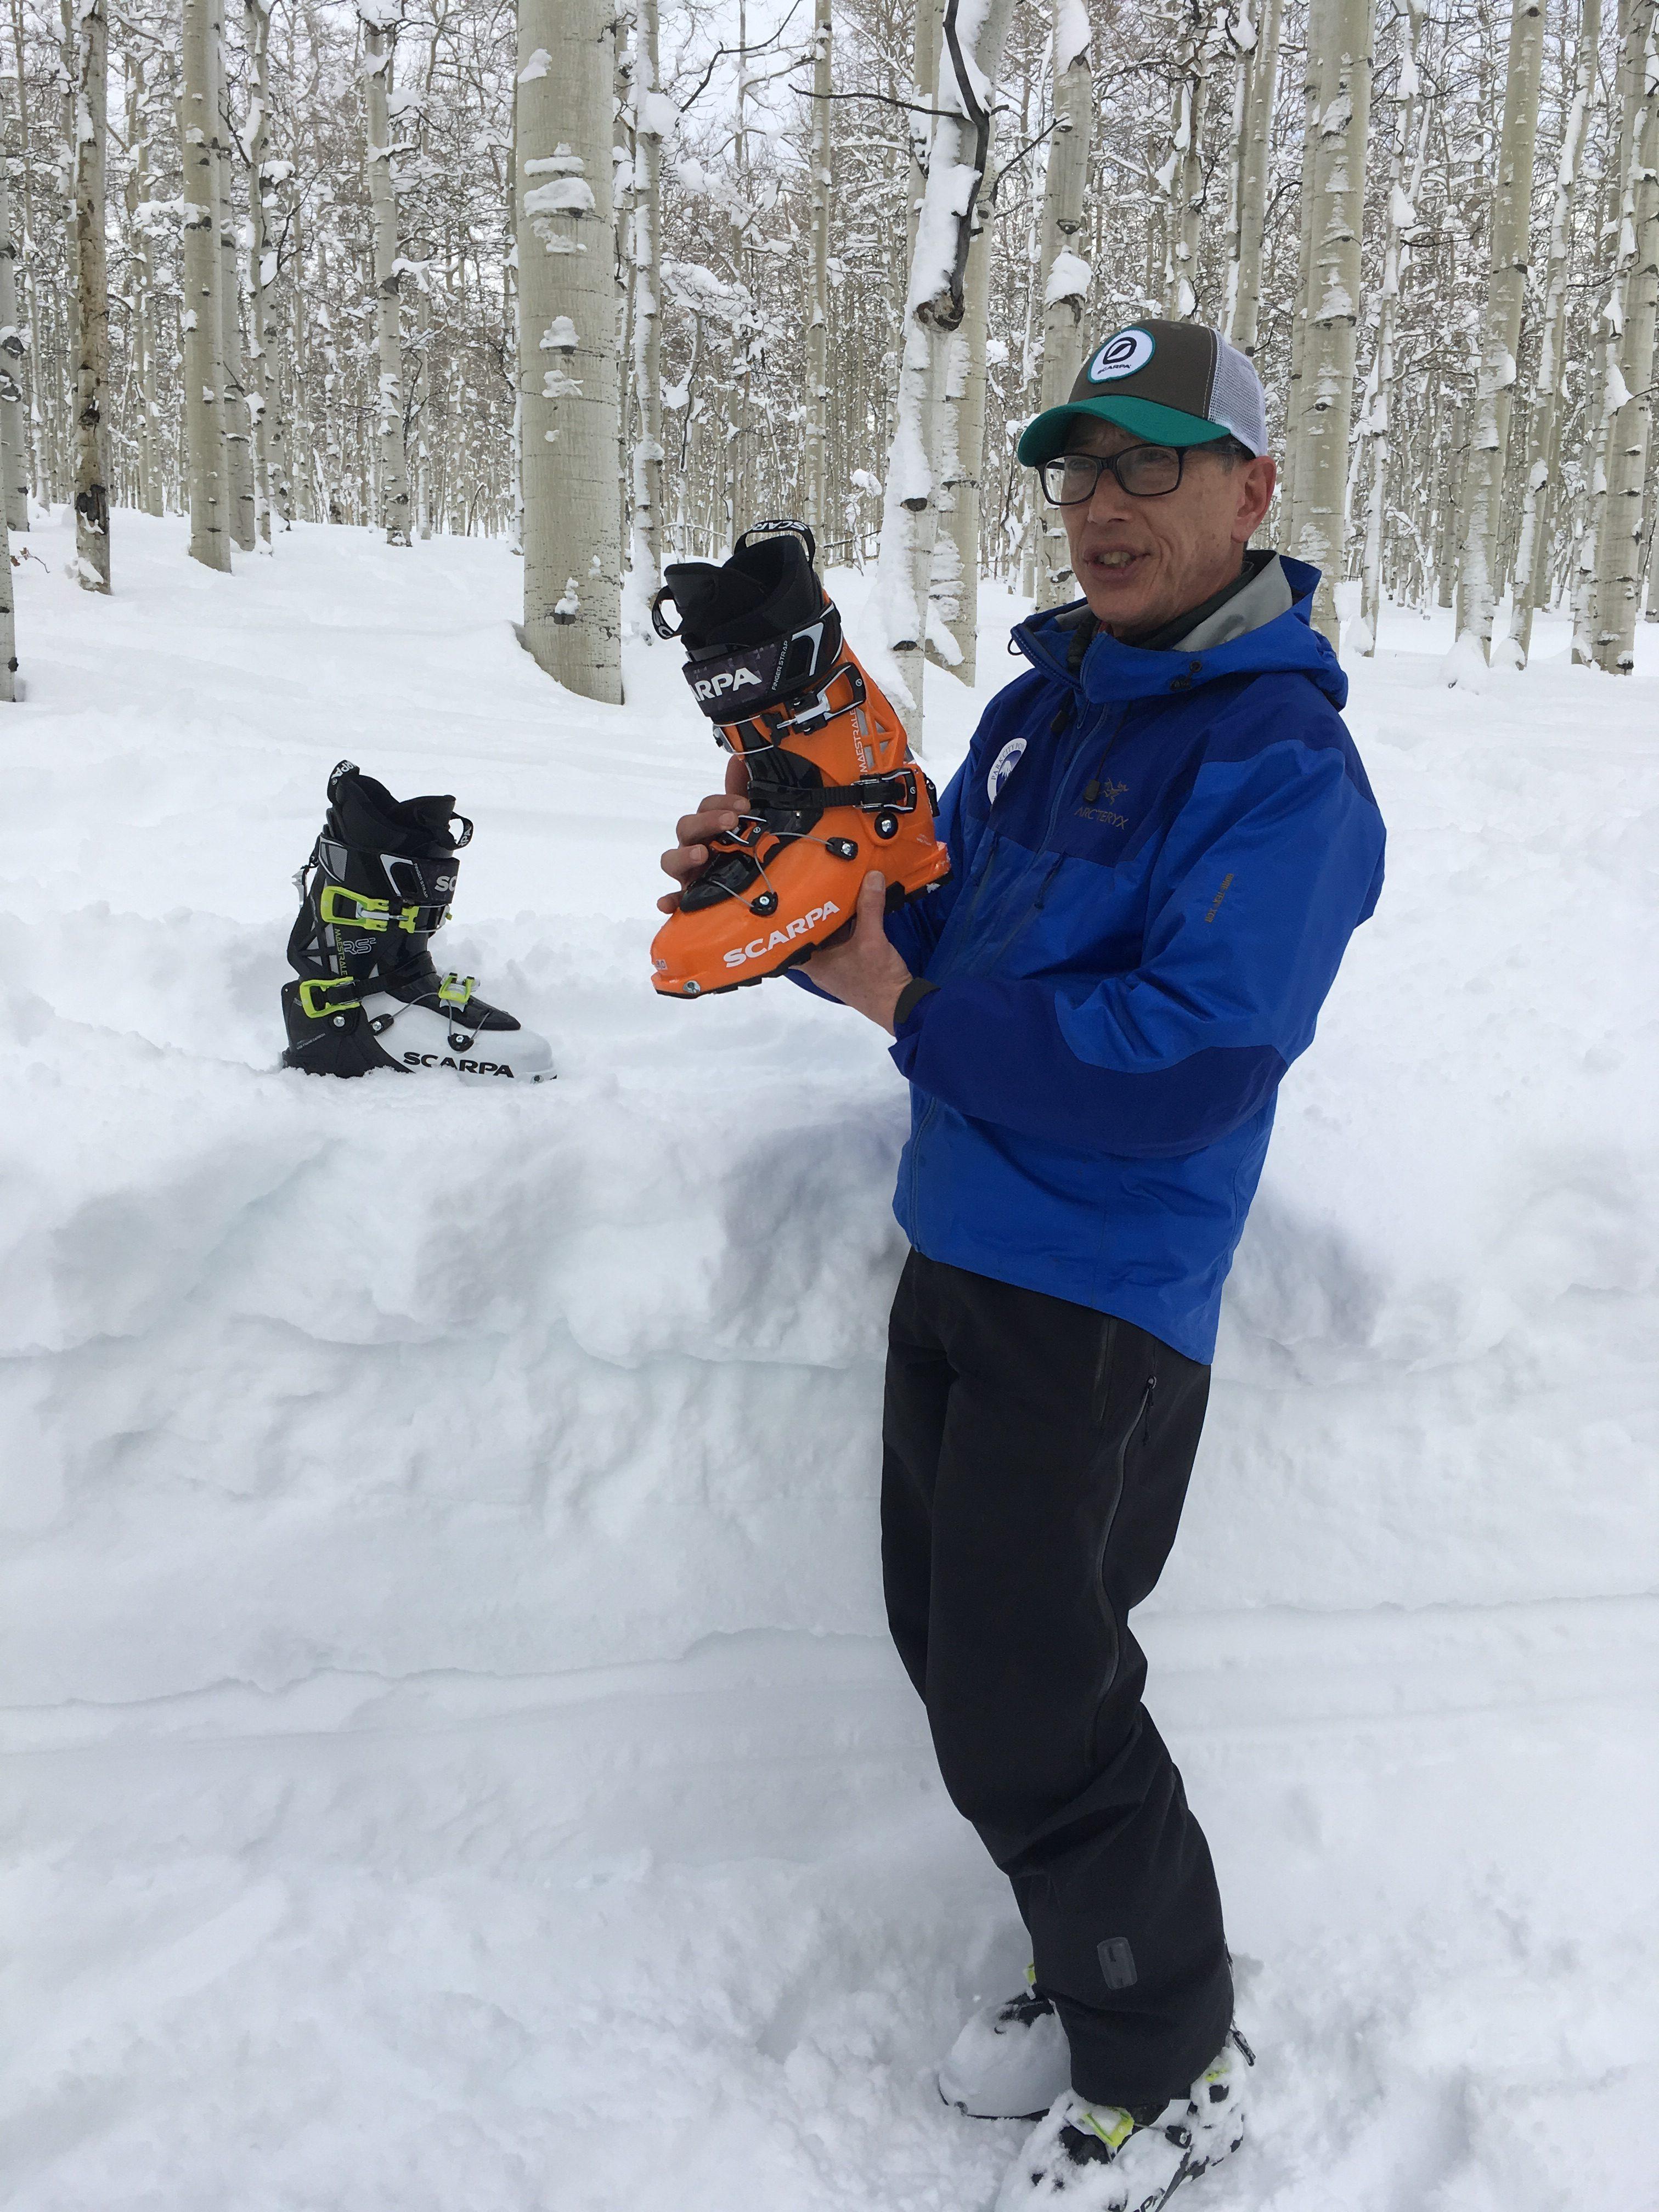 Scarpa Maestrale ski boots